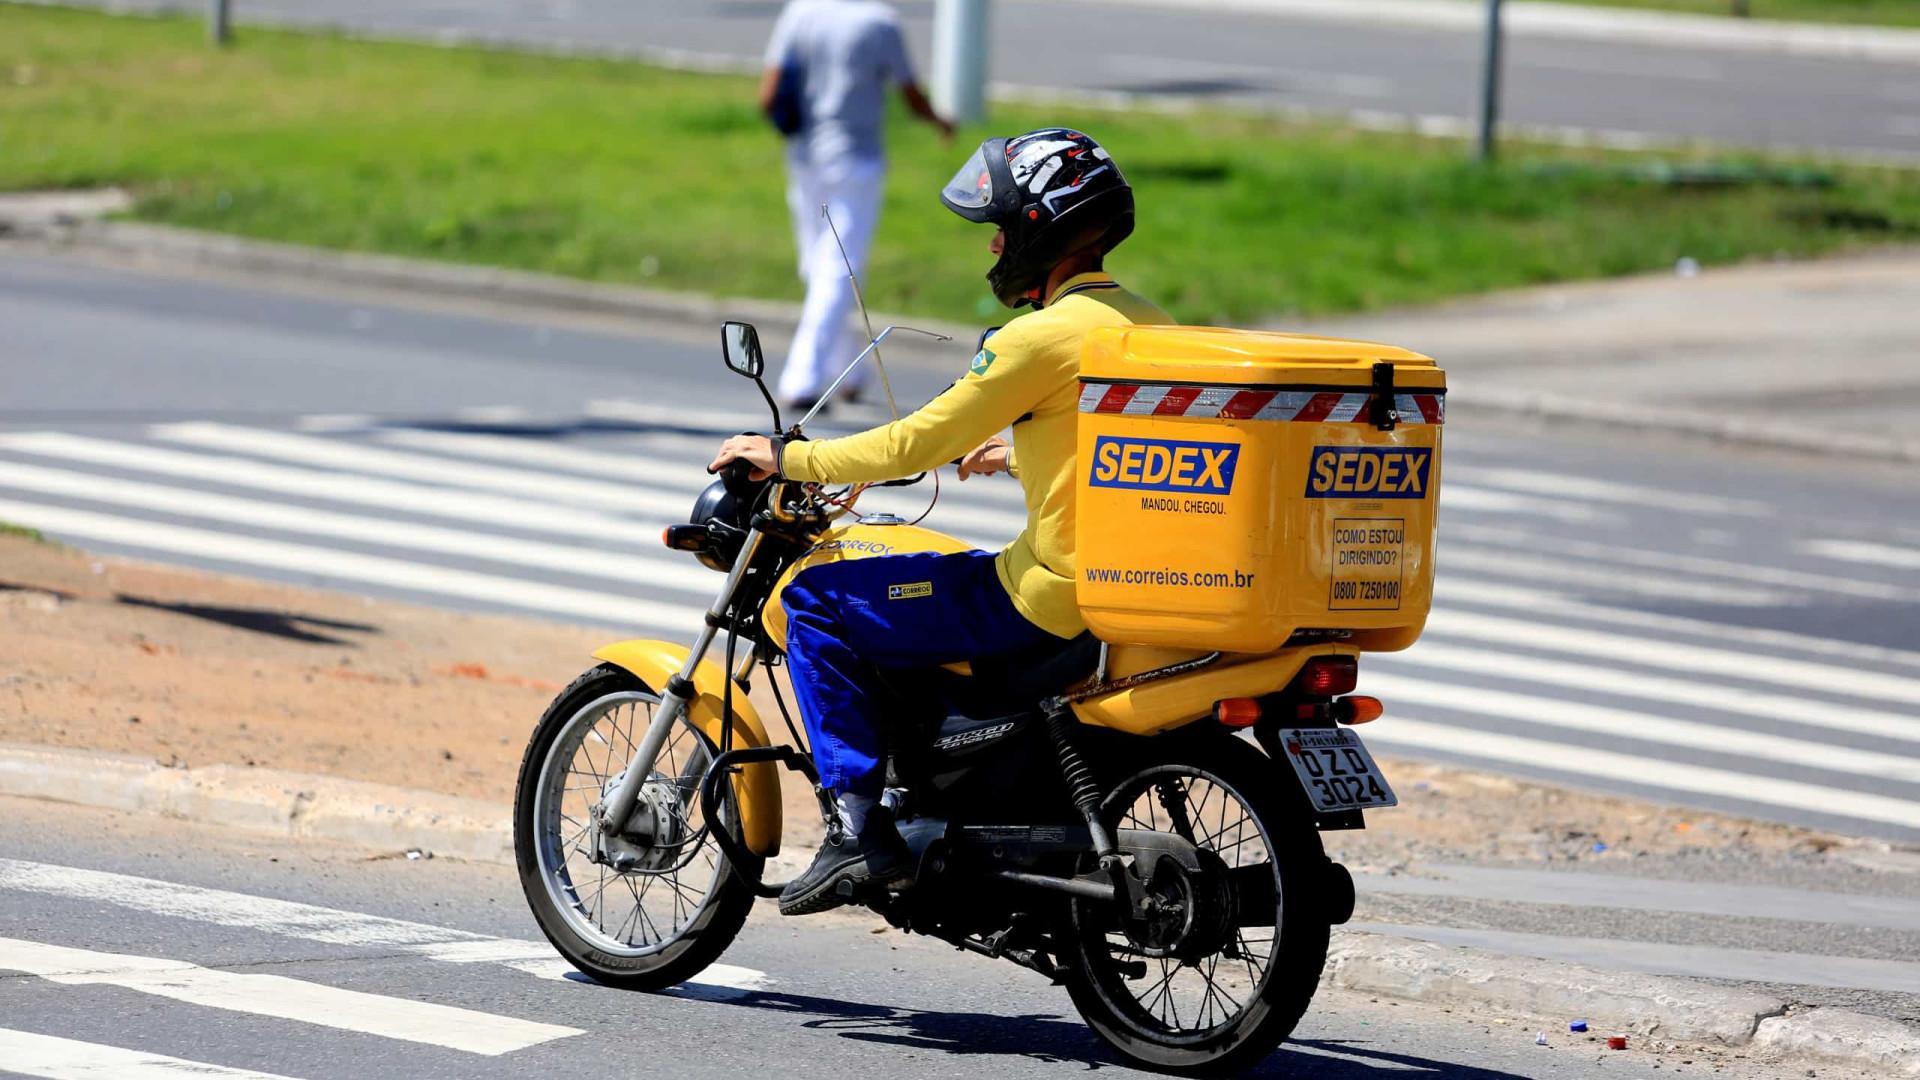 PF combate, no Rio, furtos de encomendas nos Correios